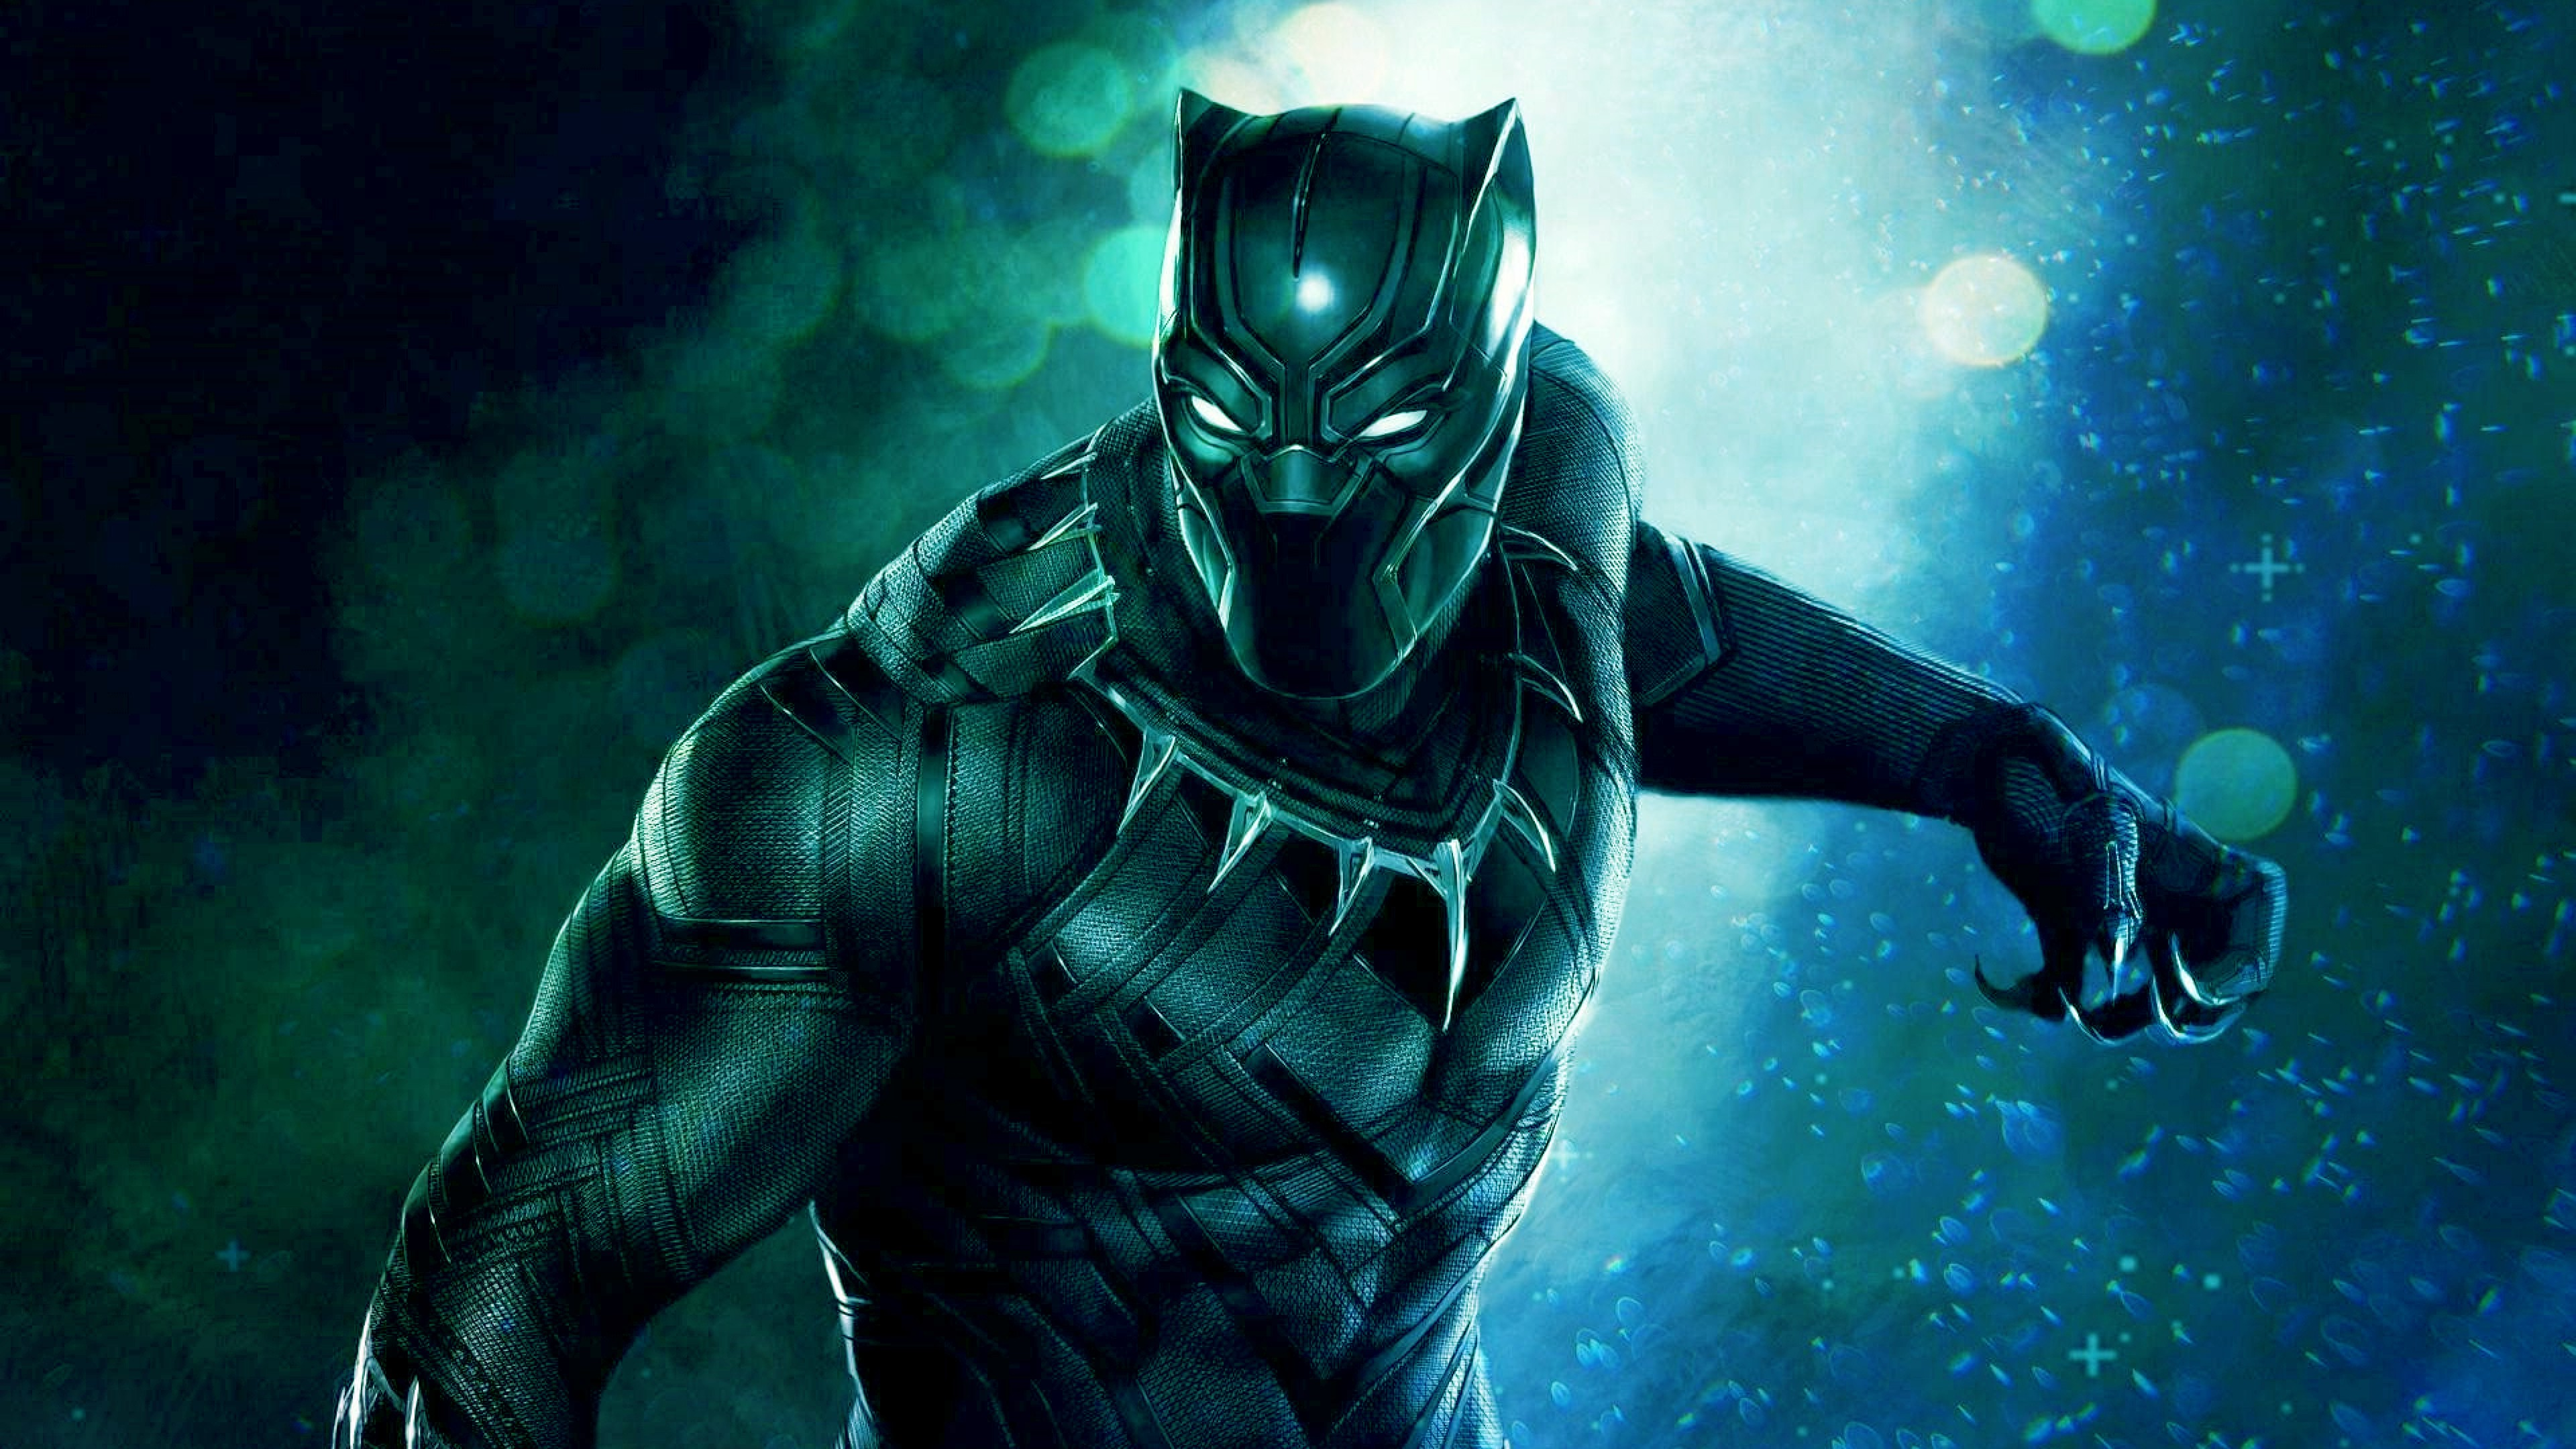 Desktop Wallpaper Black Panther Movie Superhero Pink Suit Hd